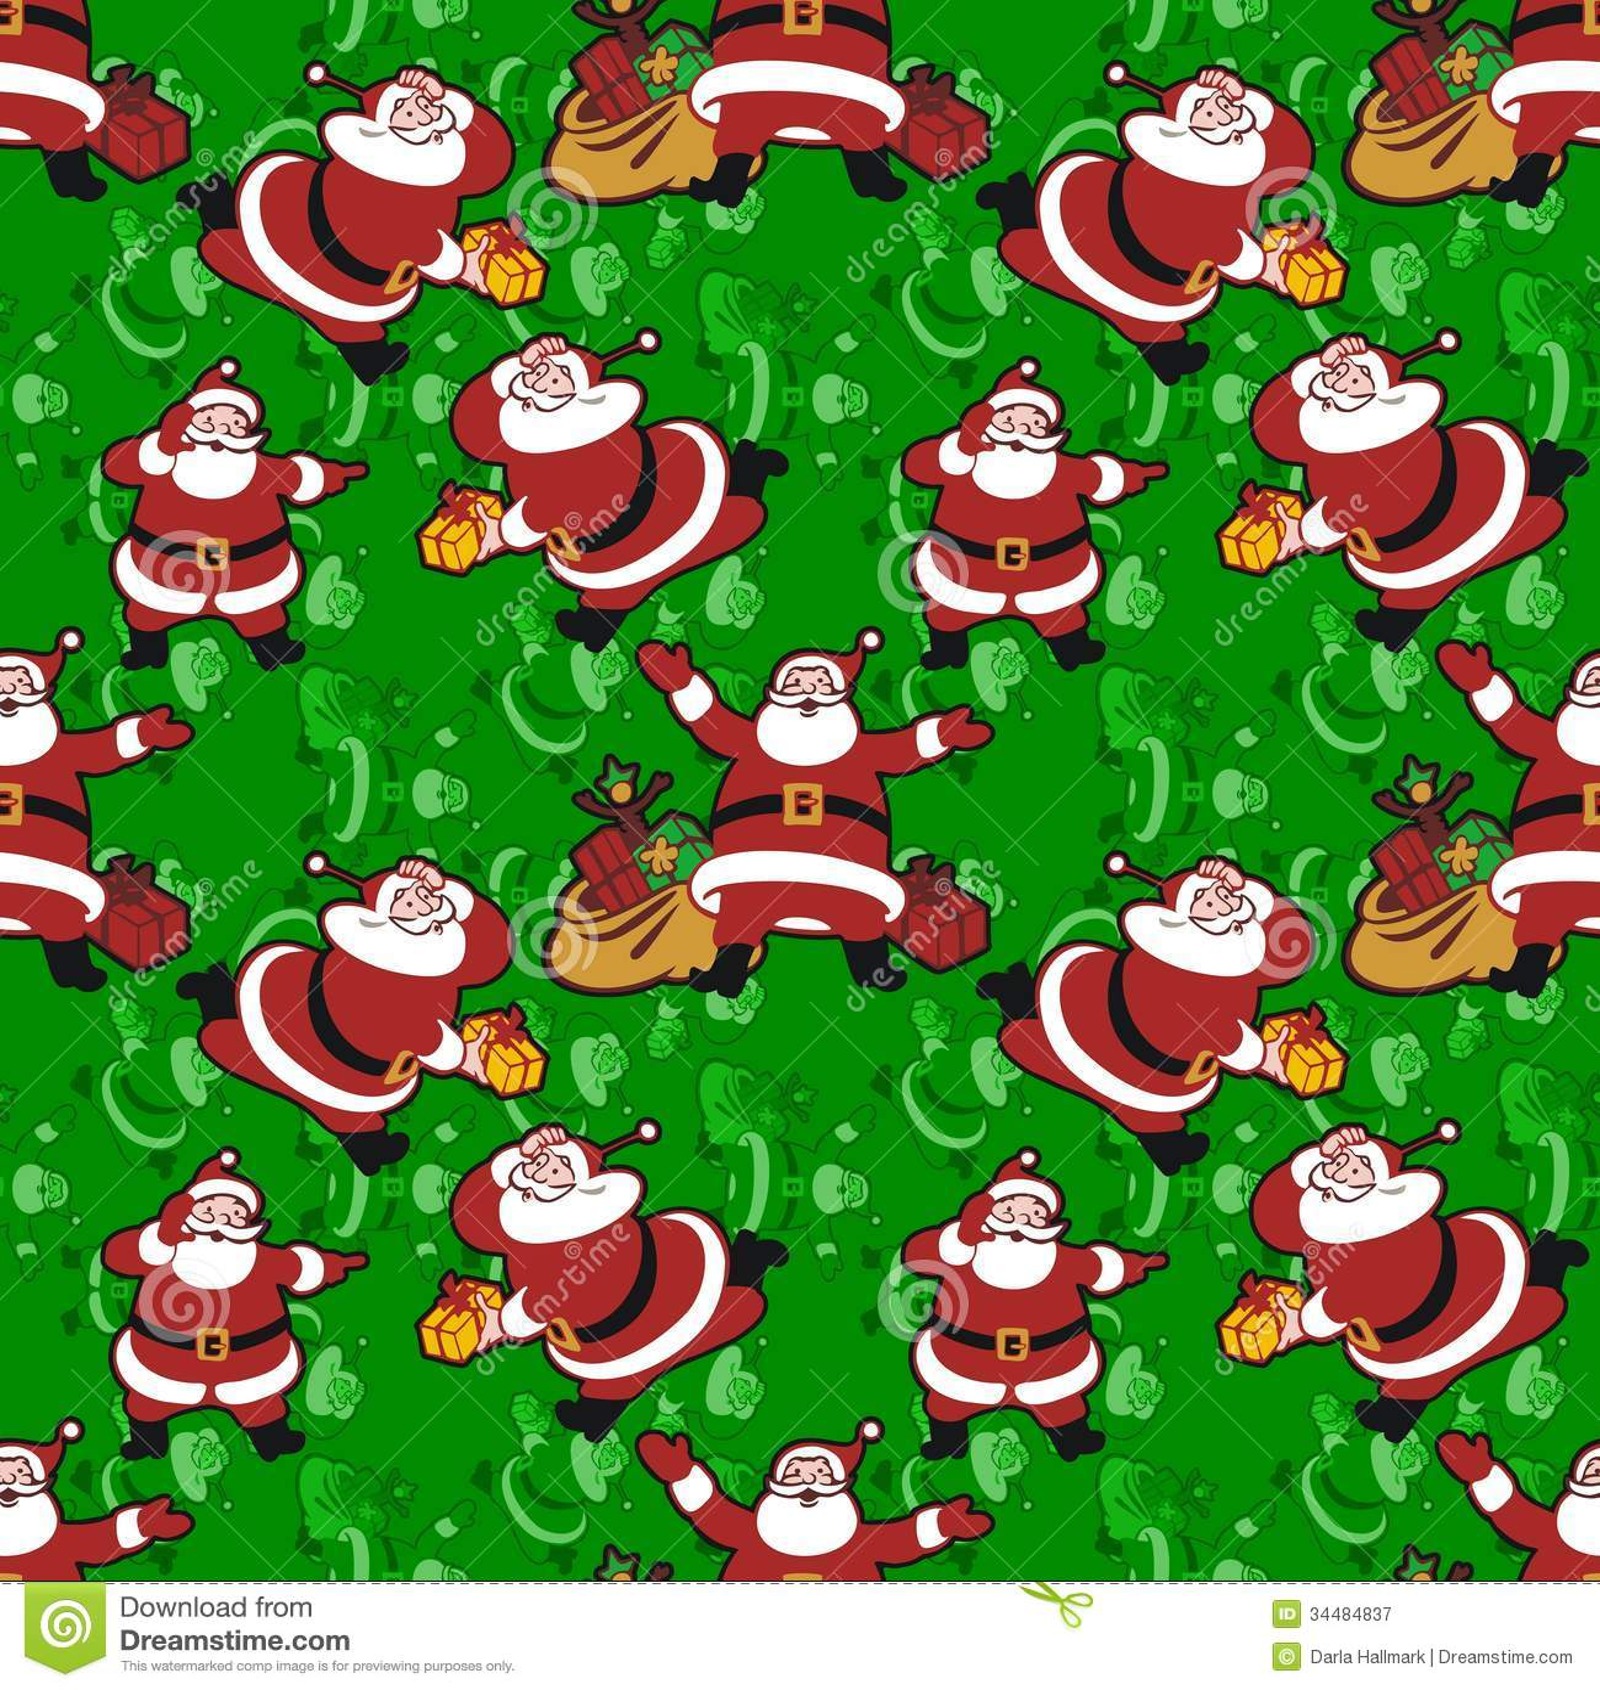 Santa Claus Pattern Royalty Free Stock Photography Image